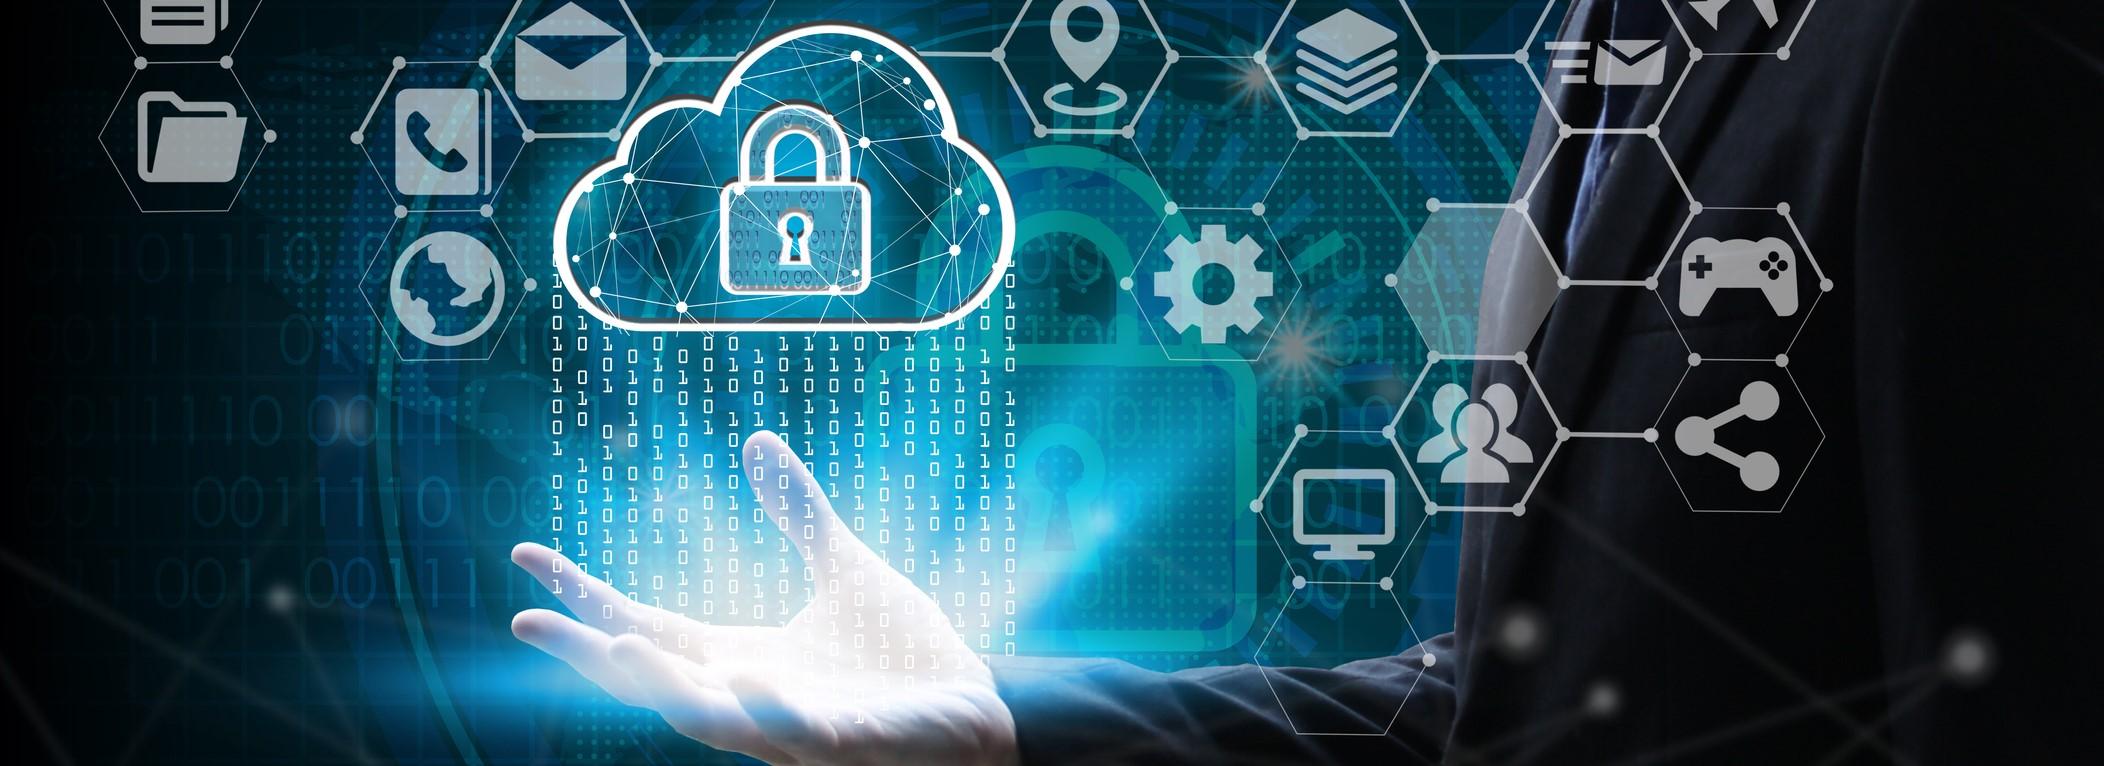 TAAItaly-it-data-breach-gdpr